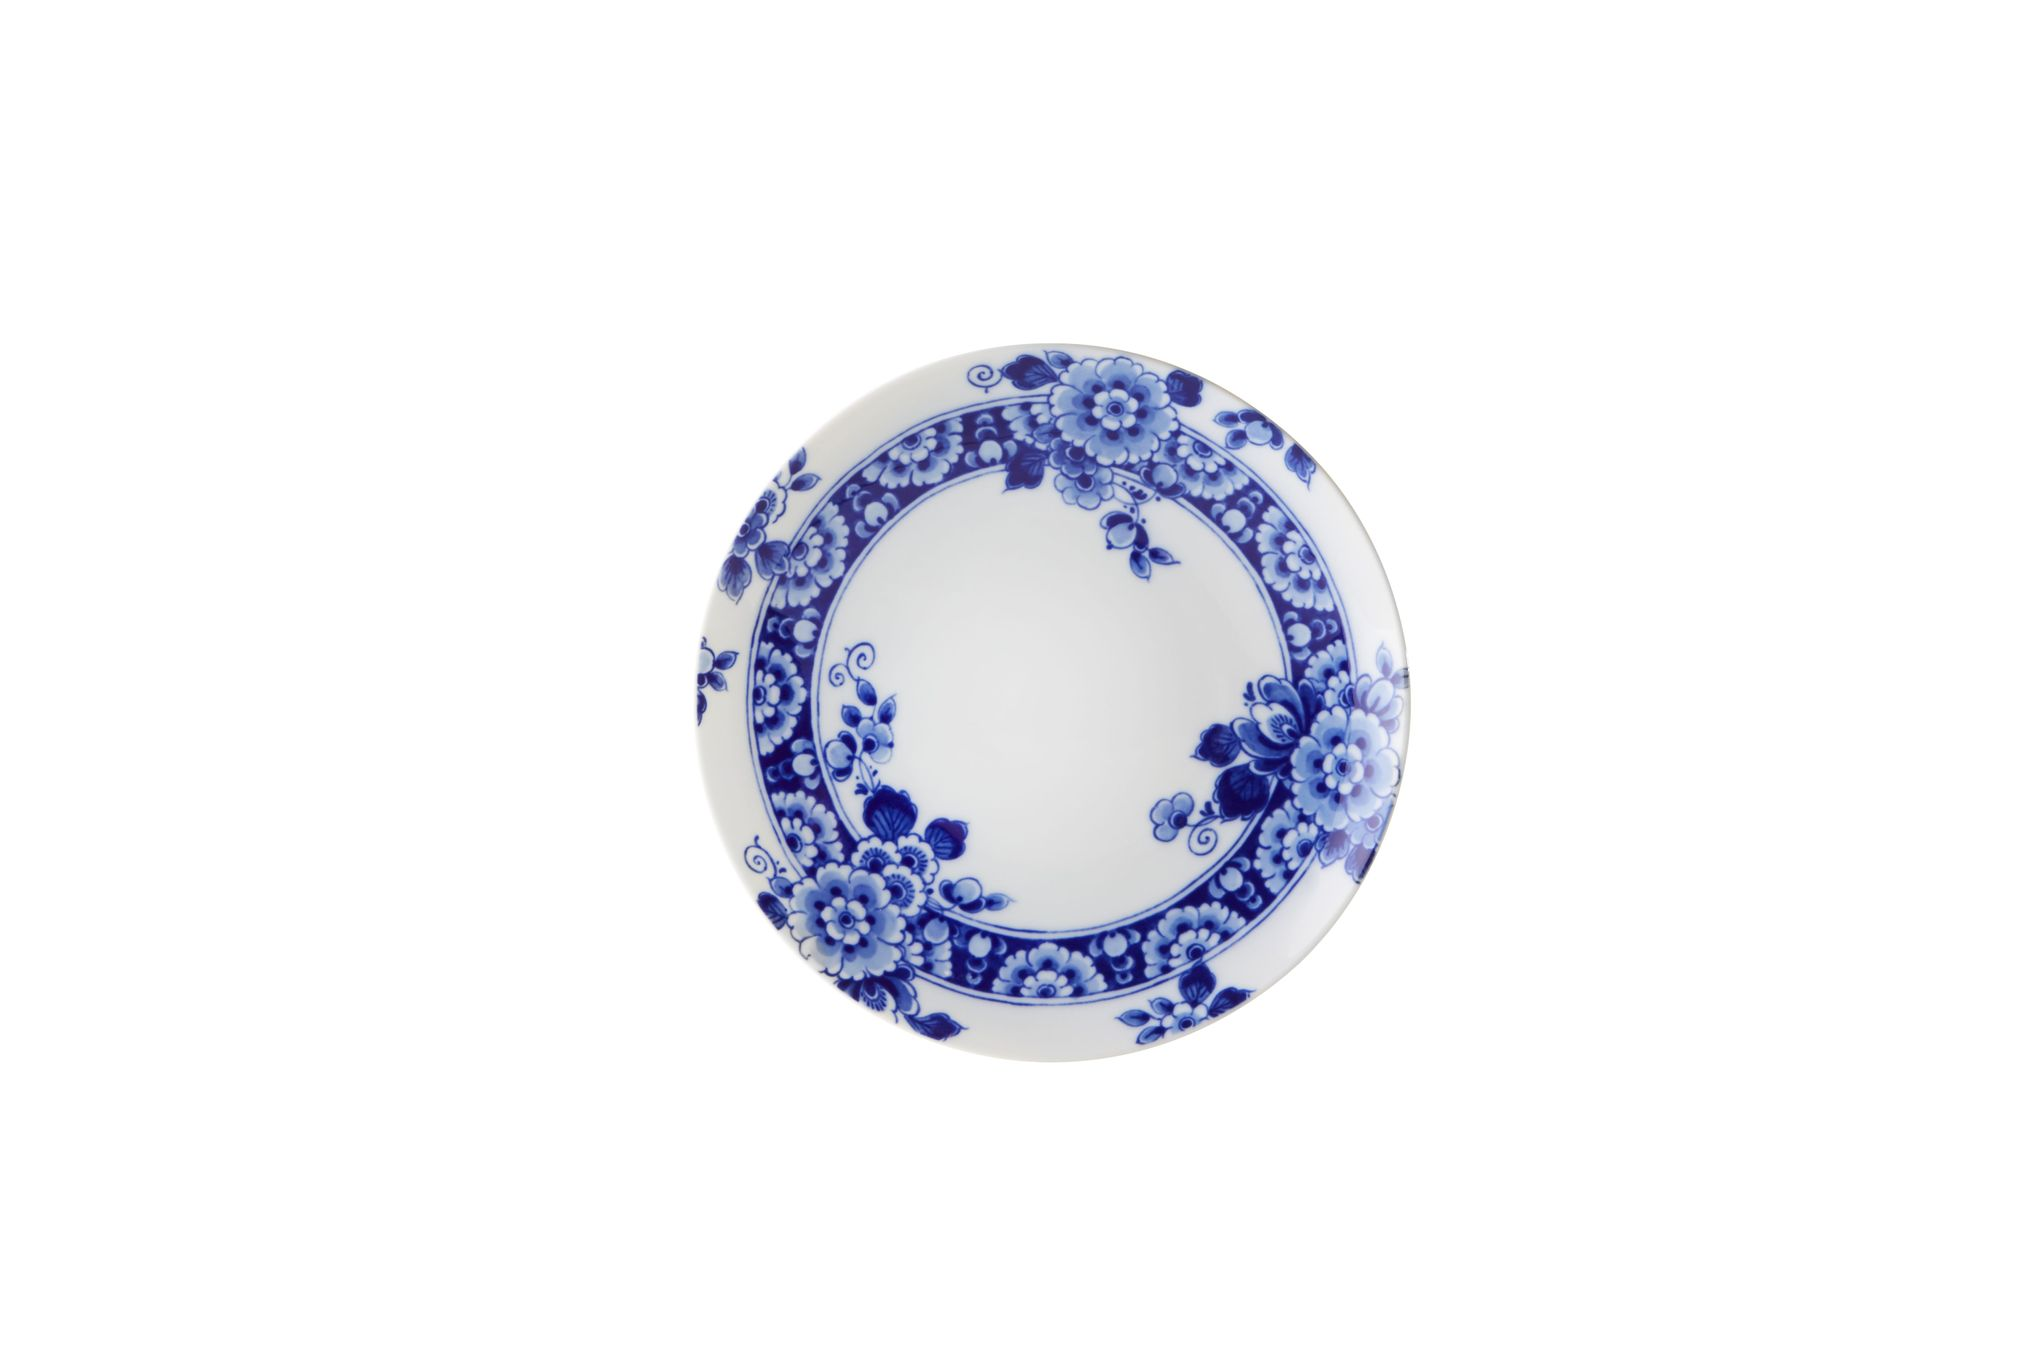 Vista Alegre Blue Ming Side Plate 23.1cm thumb 1